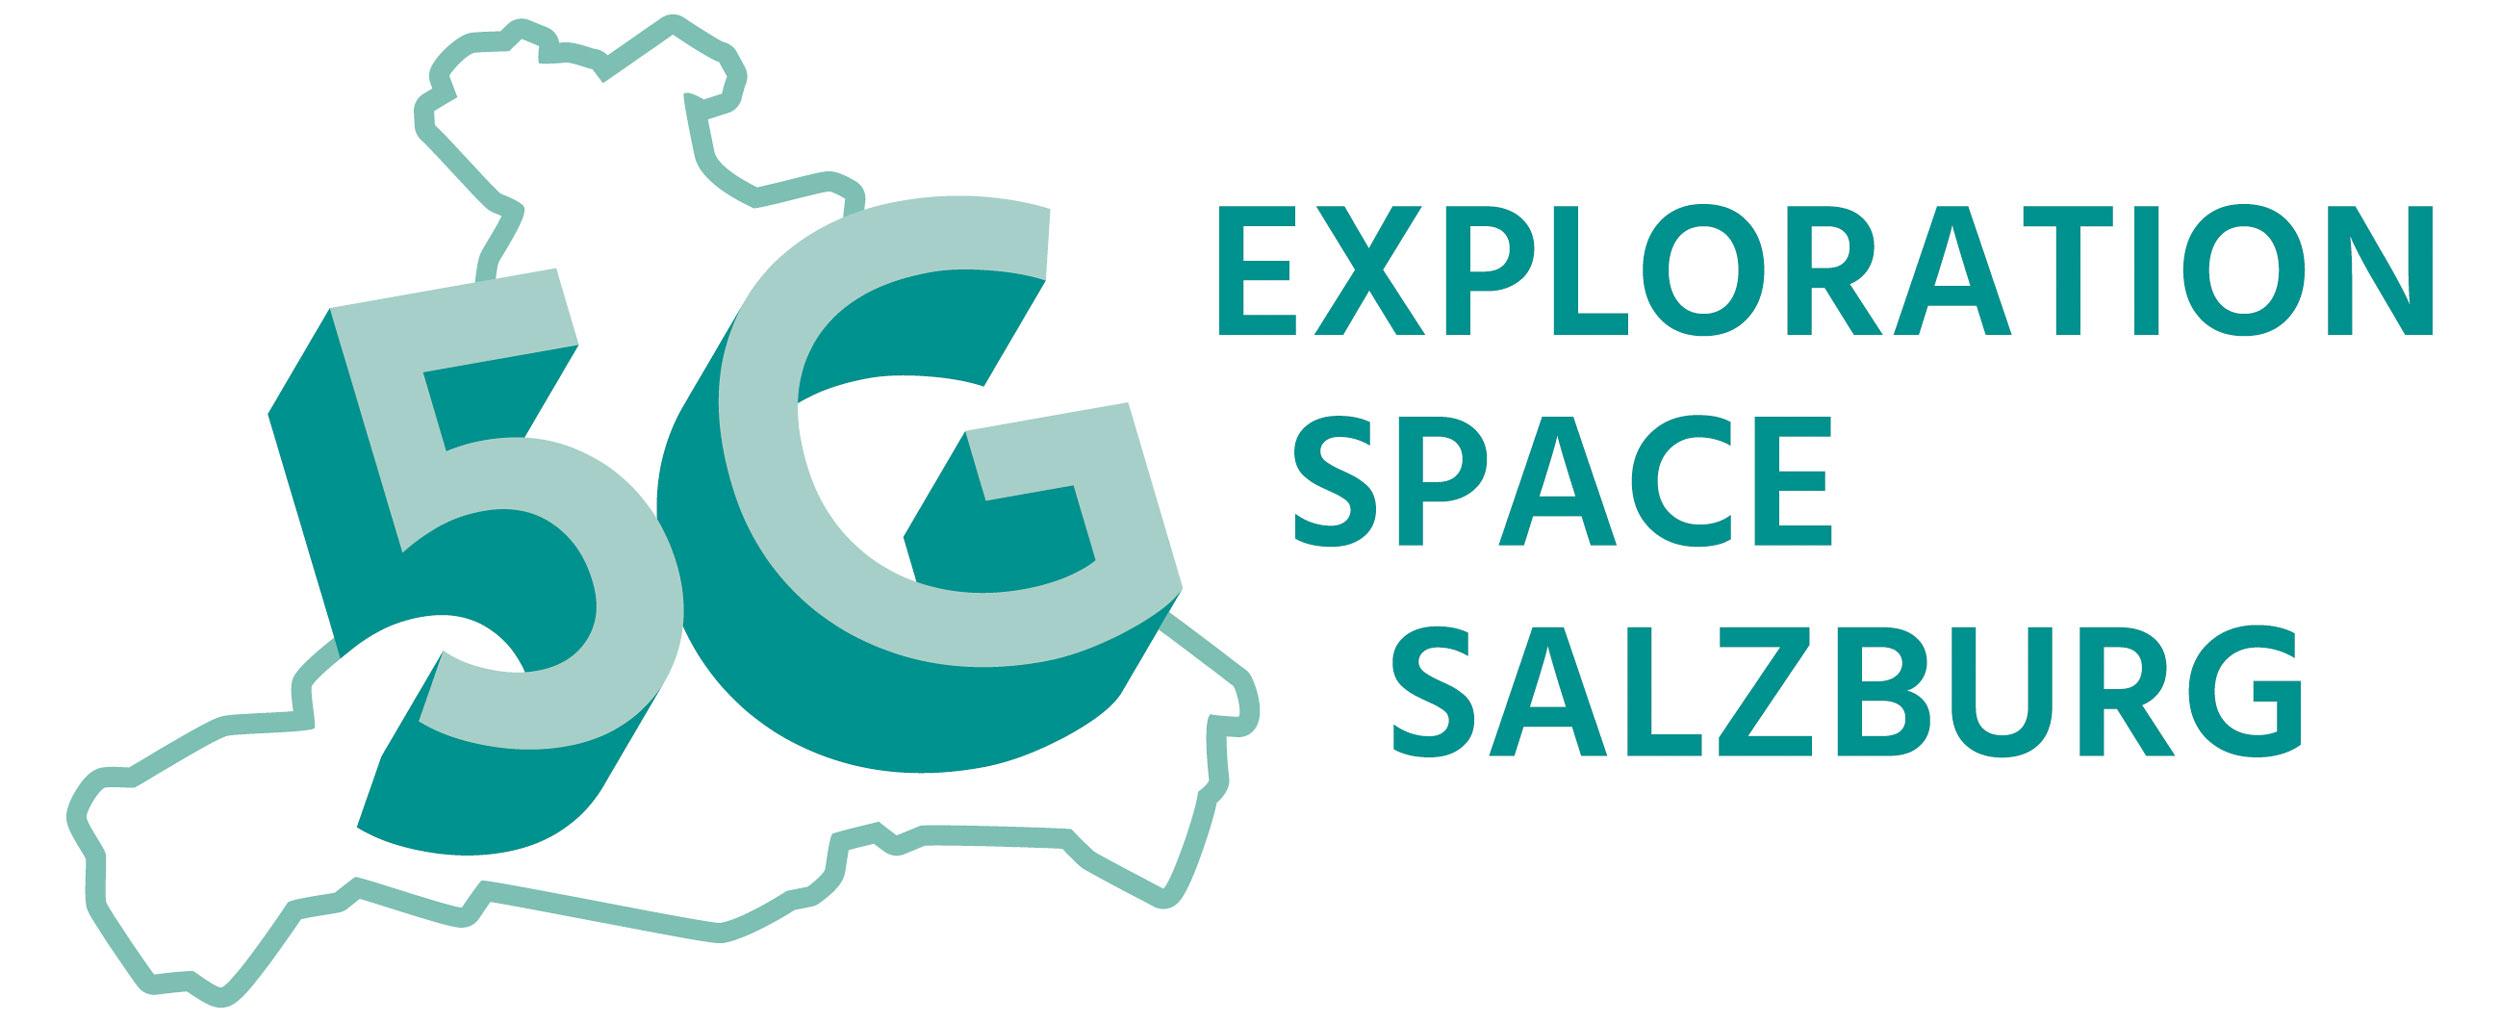 5G Exploration Space Salzburg